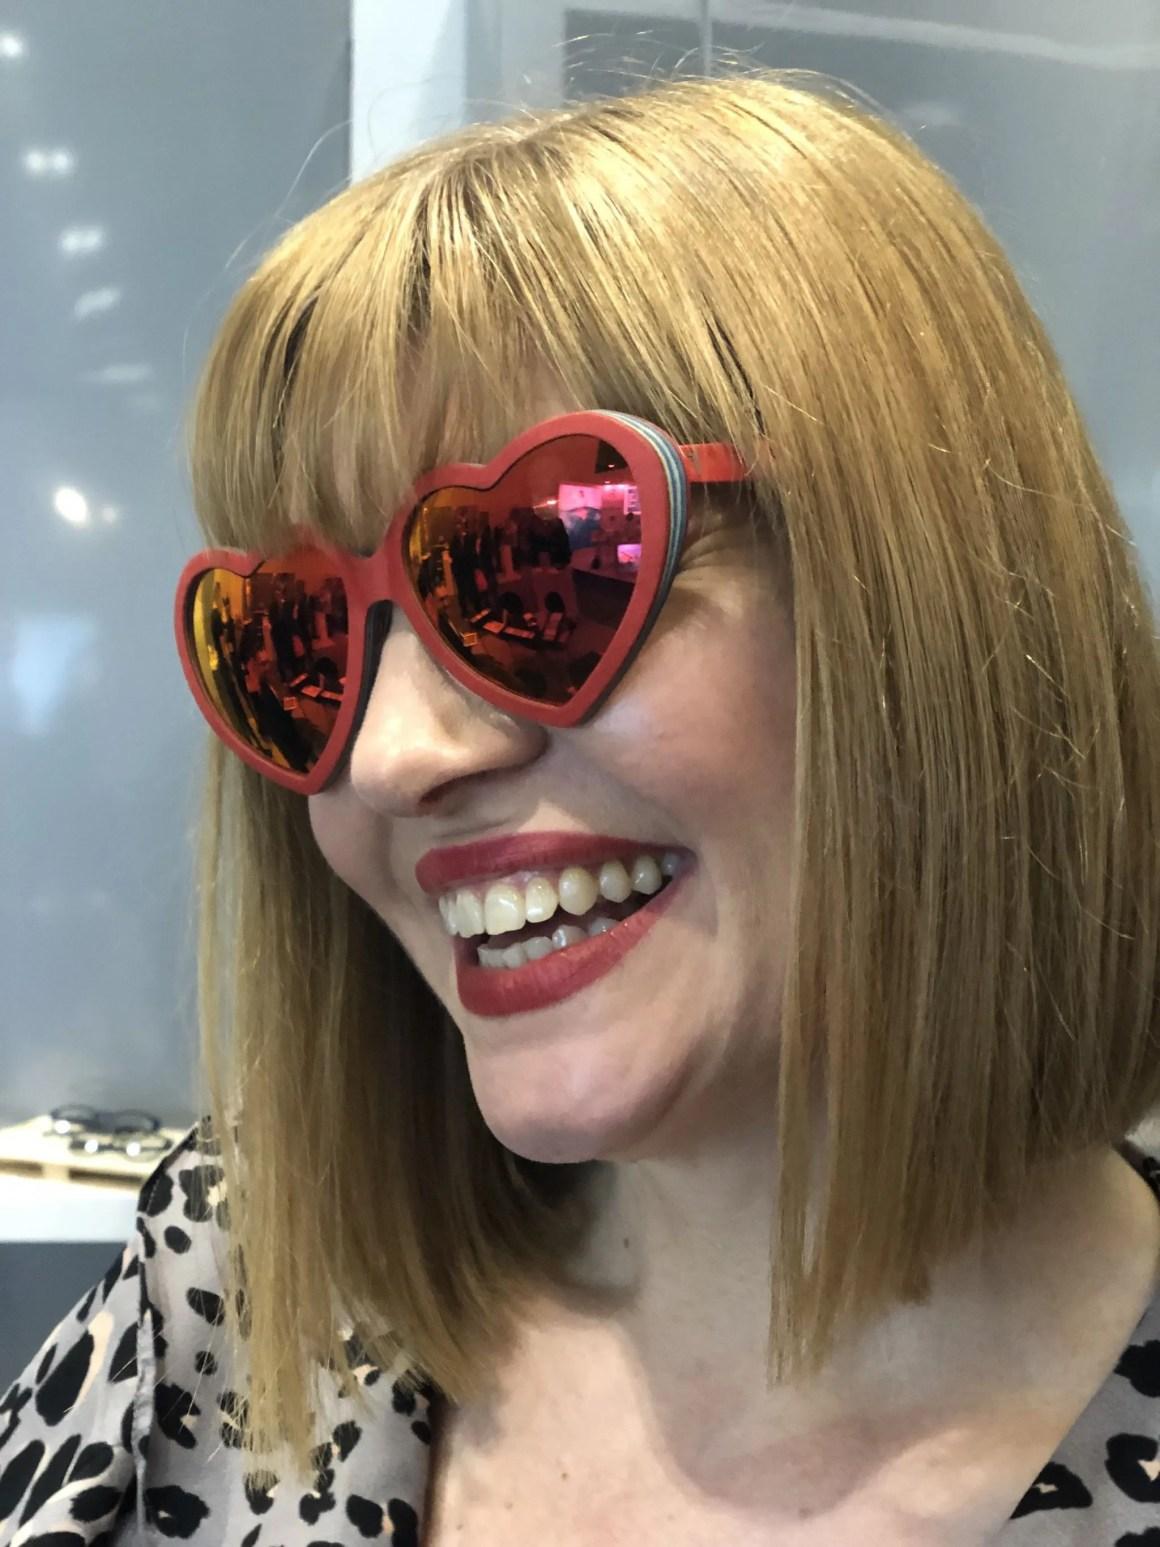 100% Optical 2019 Feb31st heart shaped glasses